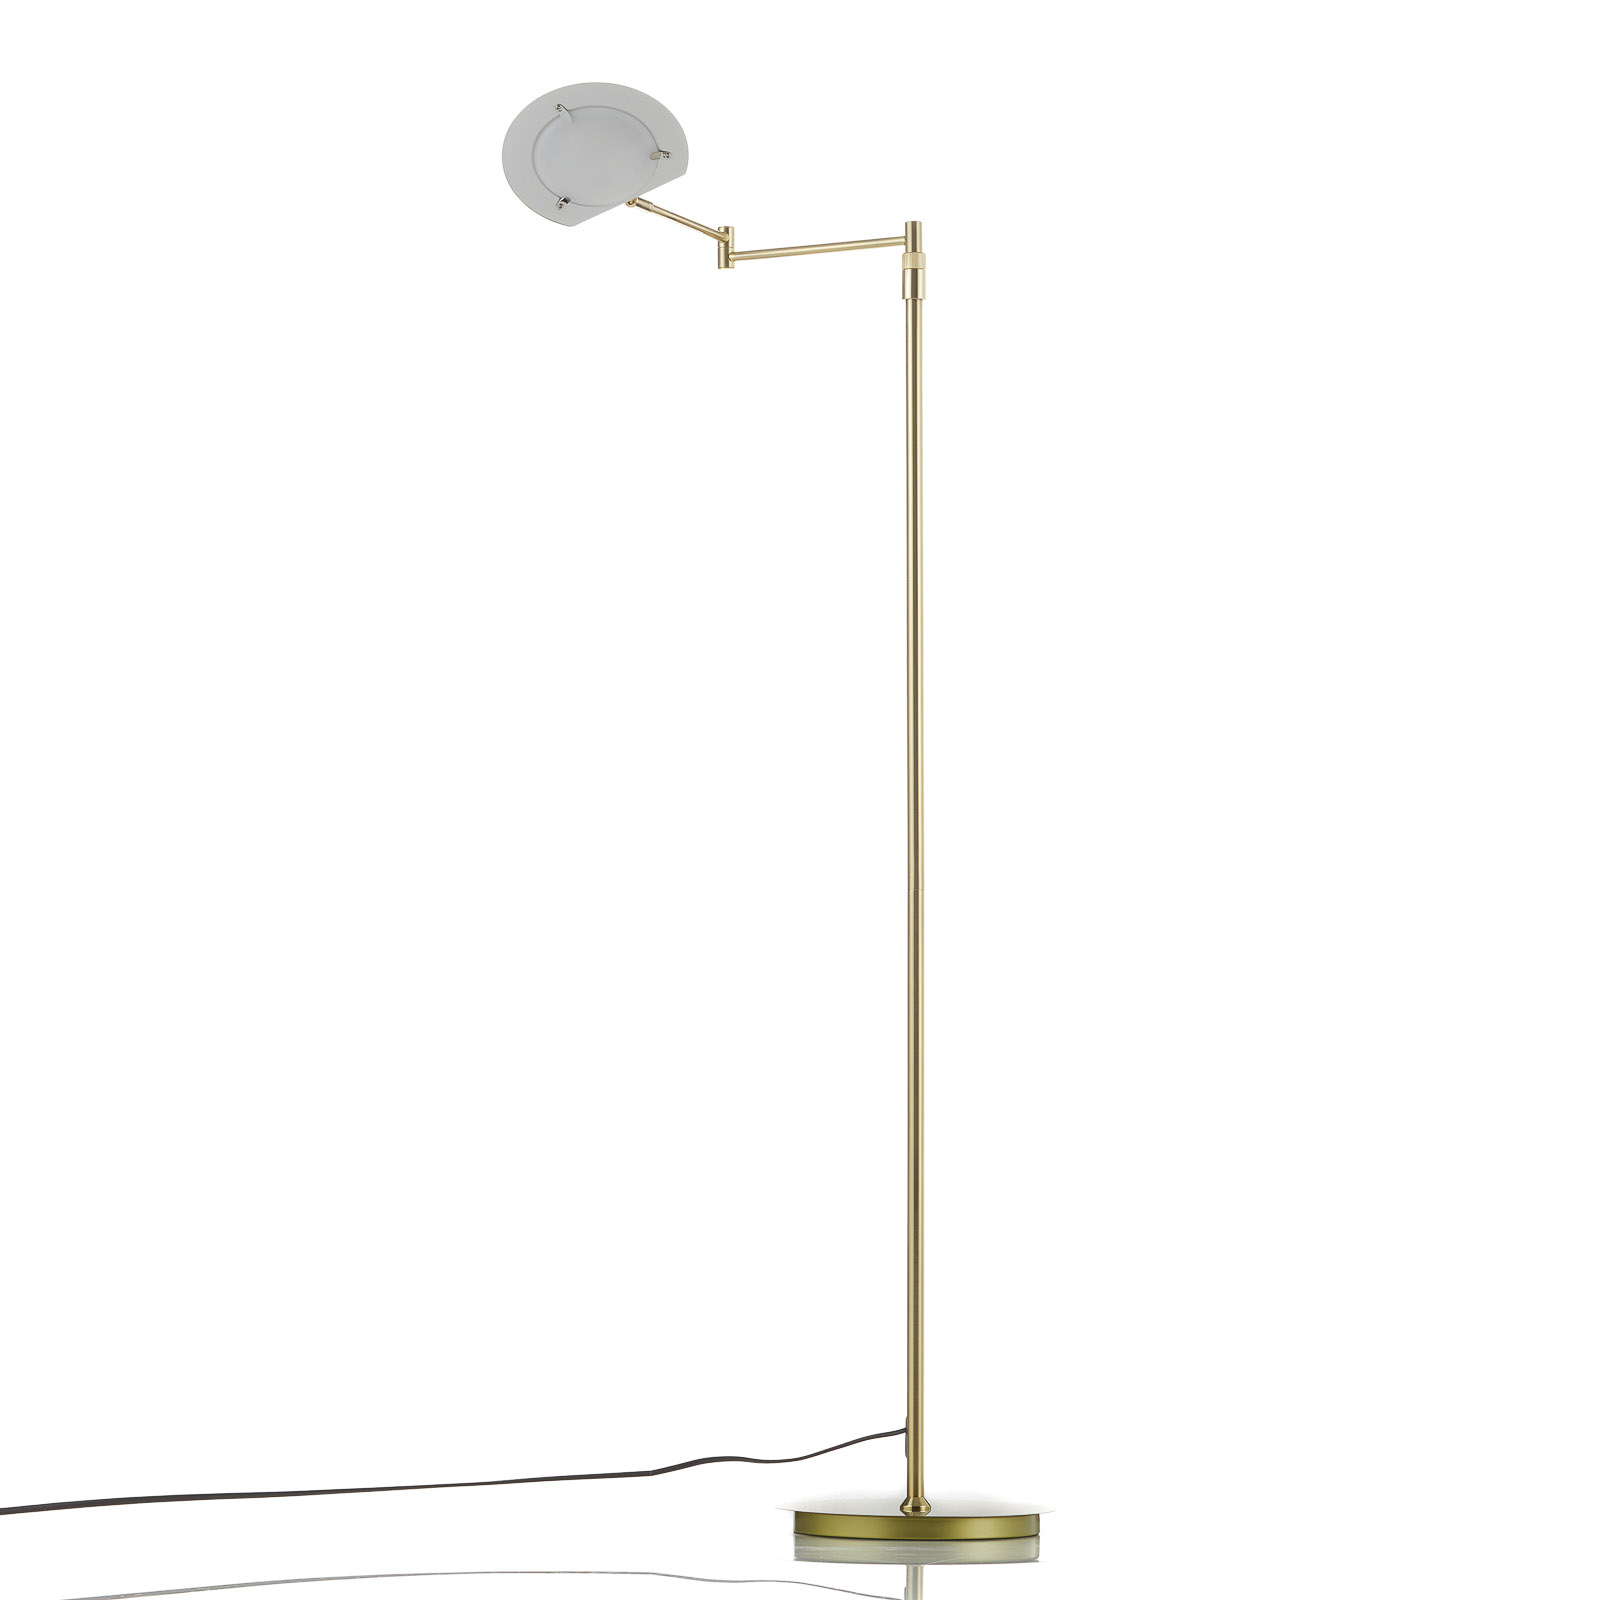 Calcio LED-gulvlampe, justerbar, matt messing